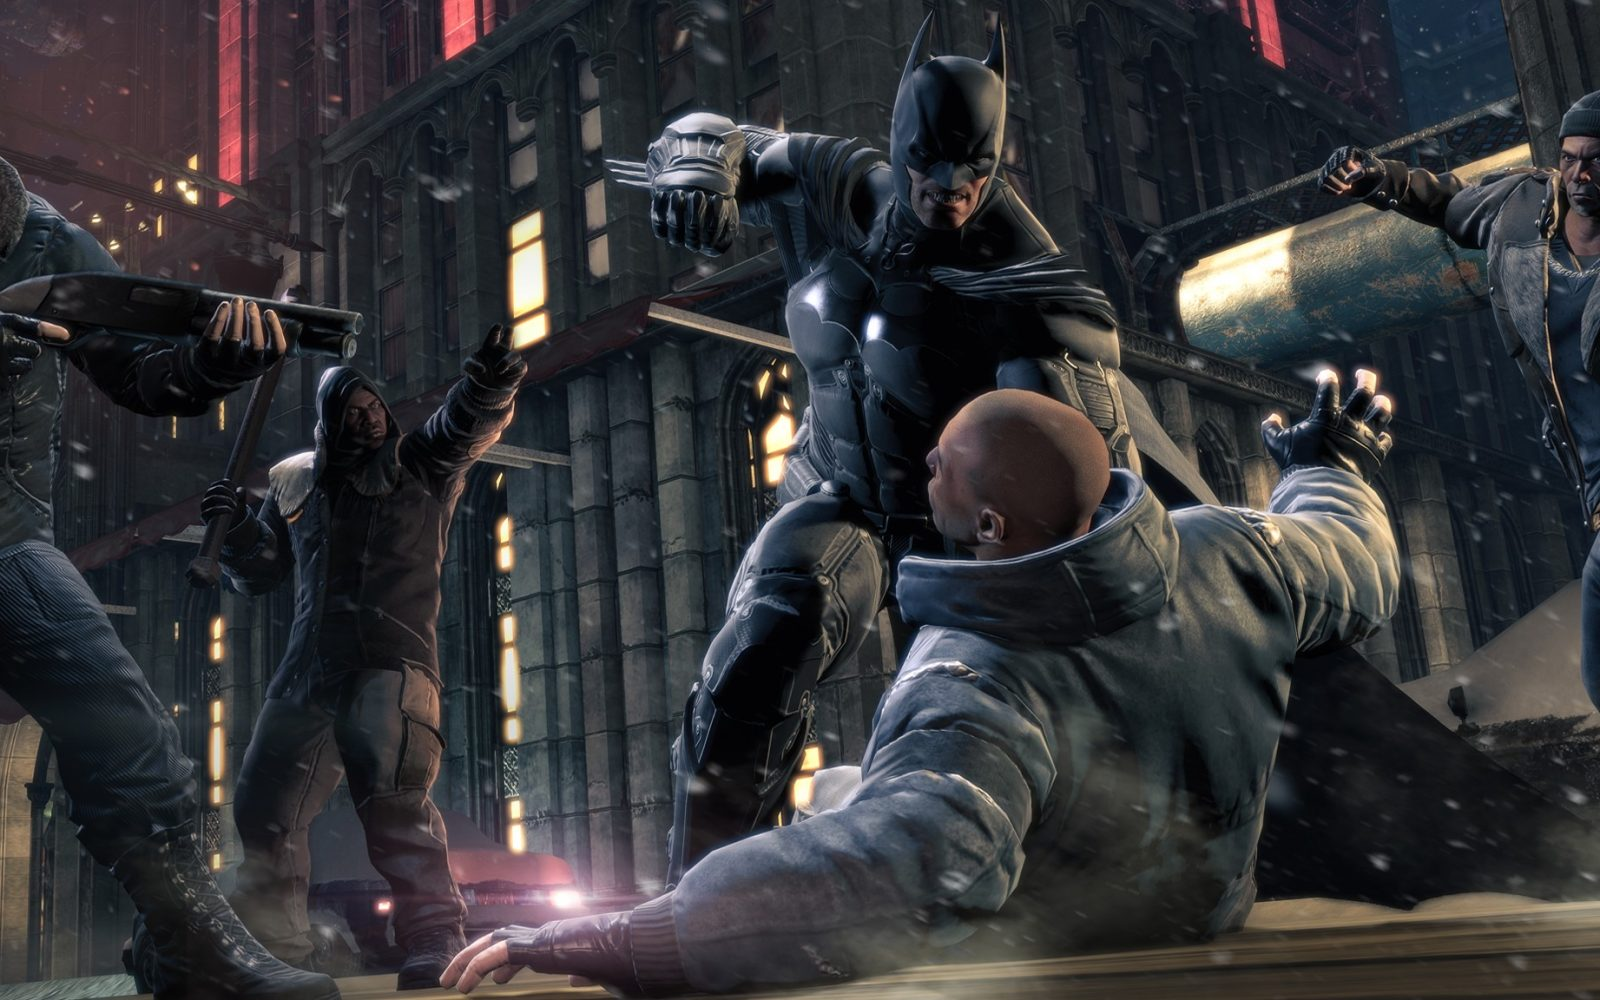 Batman Arkham Origins 9to5toys Return To Asylum Reg 3 Ps4